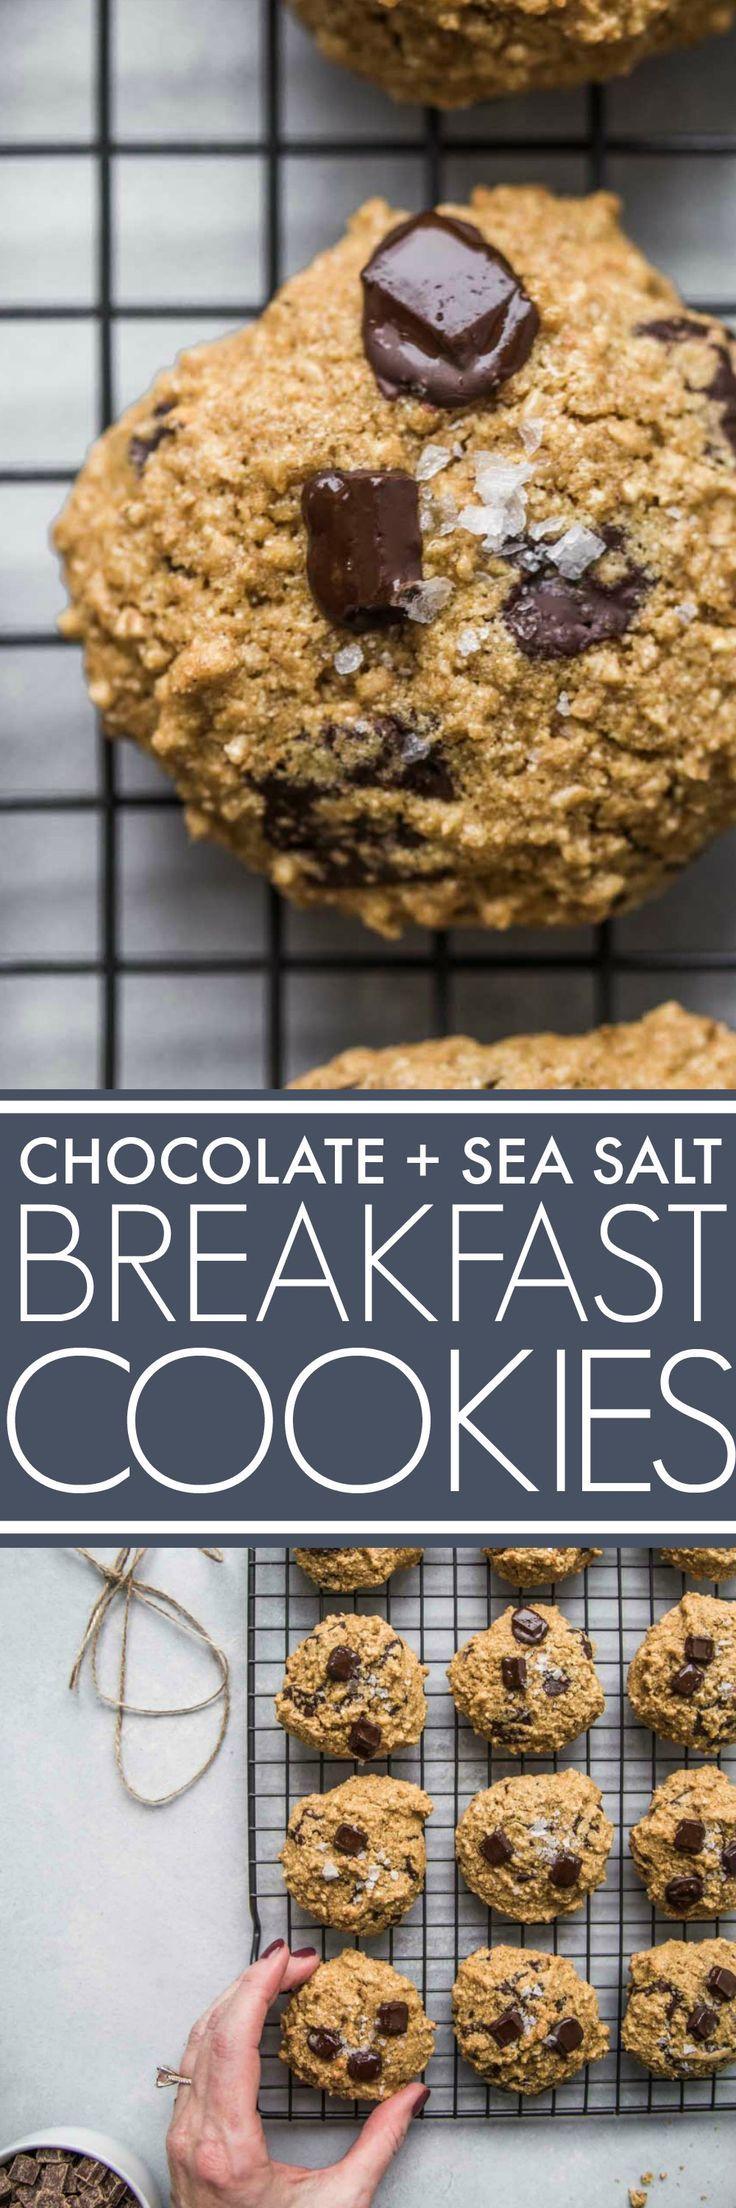 Chocolate + Sea Salt Breakfast Cookies